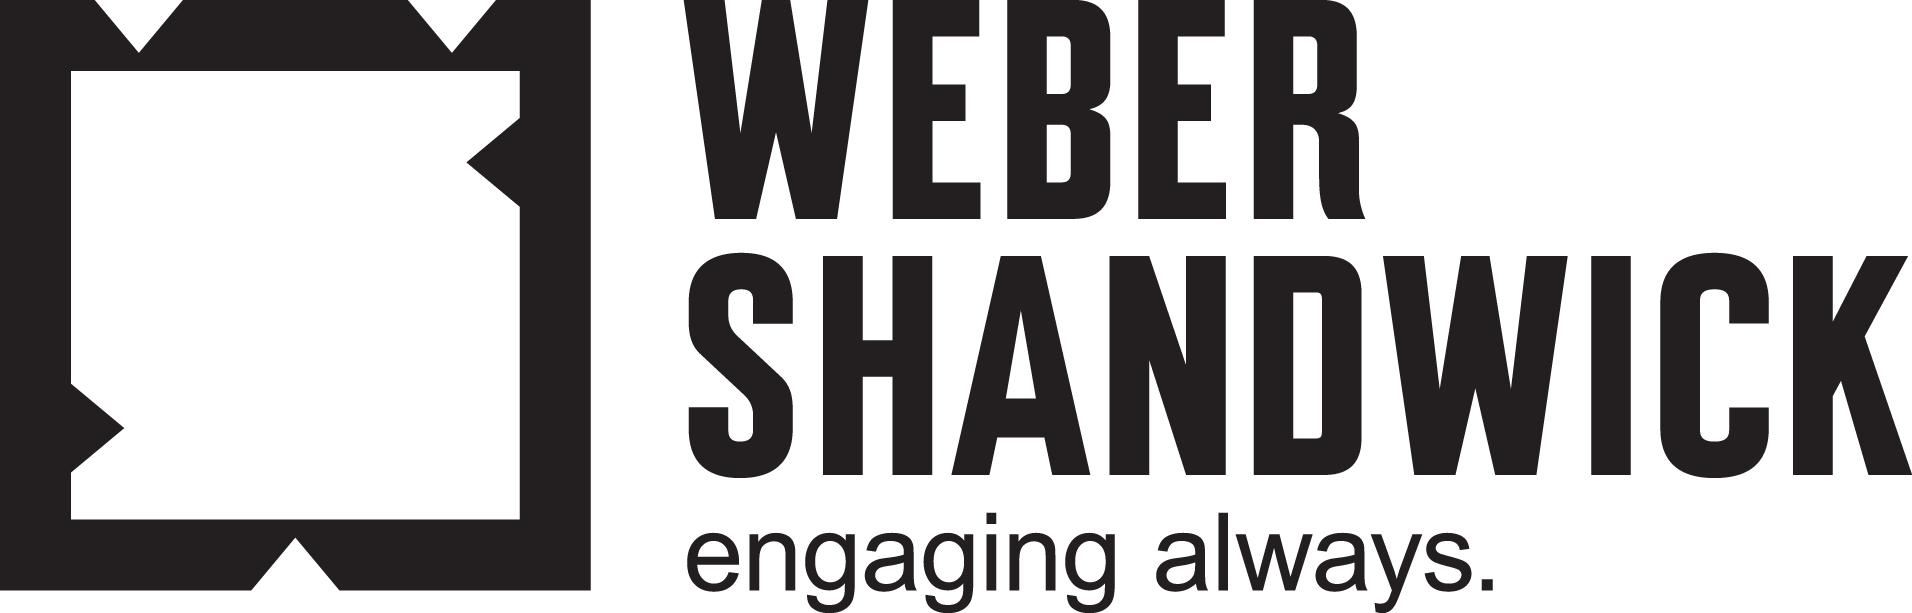 Weber Shandwick New Logo Prca Mena